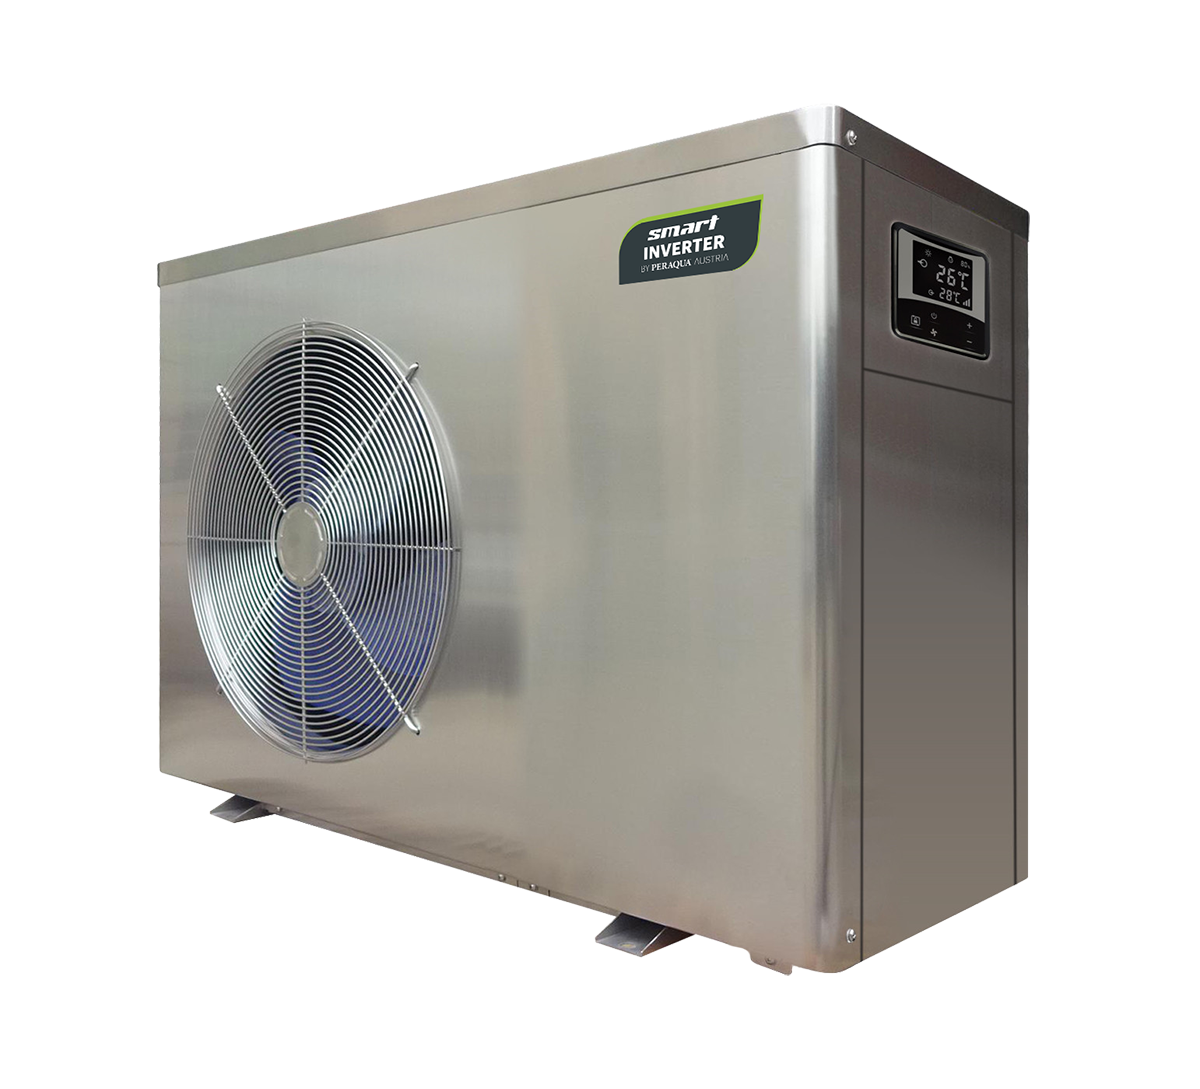 Smart Full Inverter Plus heat pump H+C 12,8kW, V2A, refrigerant R32 Smart Full Inverter Plus heat pump H+C 12,8kW, V2A, refrigerant R32